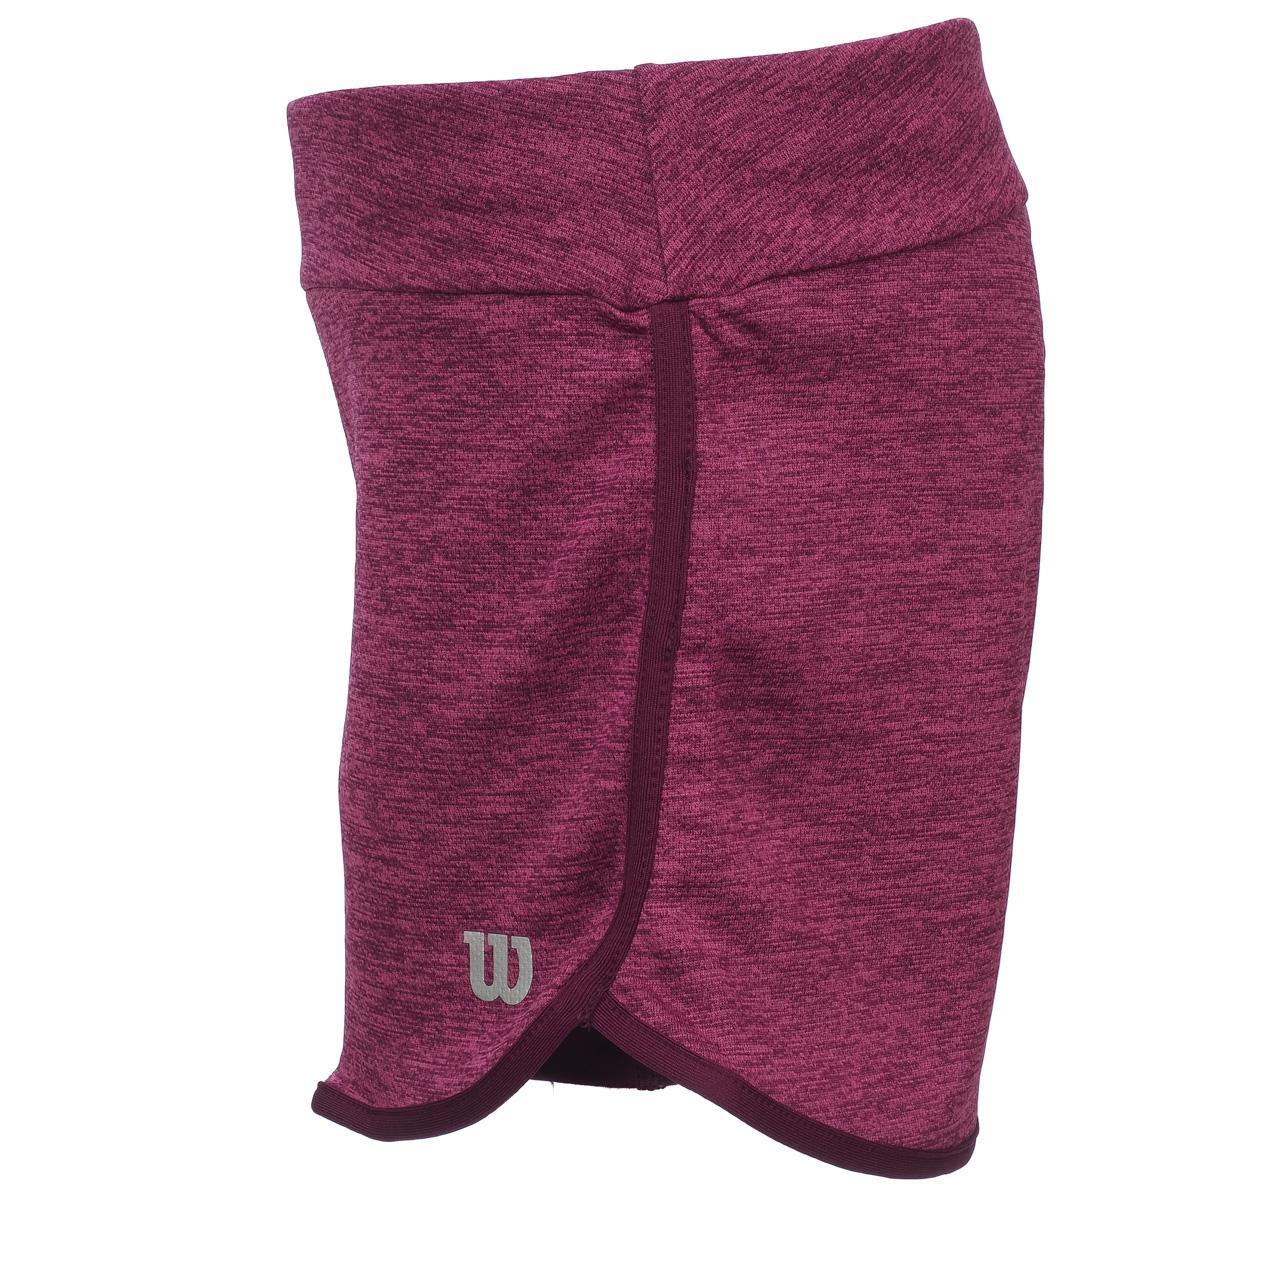 short-Tennis-Wilson-G-Core-3-5-Shorts-Maedchen-Lila-90184-Neu Indexbild 2